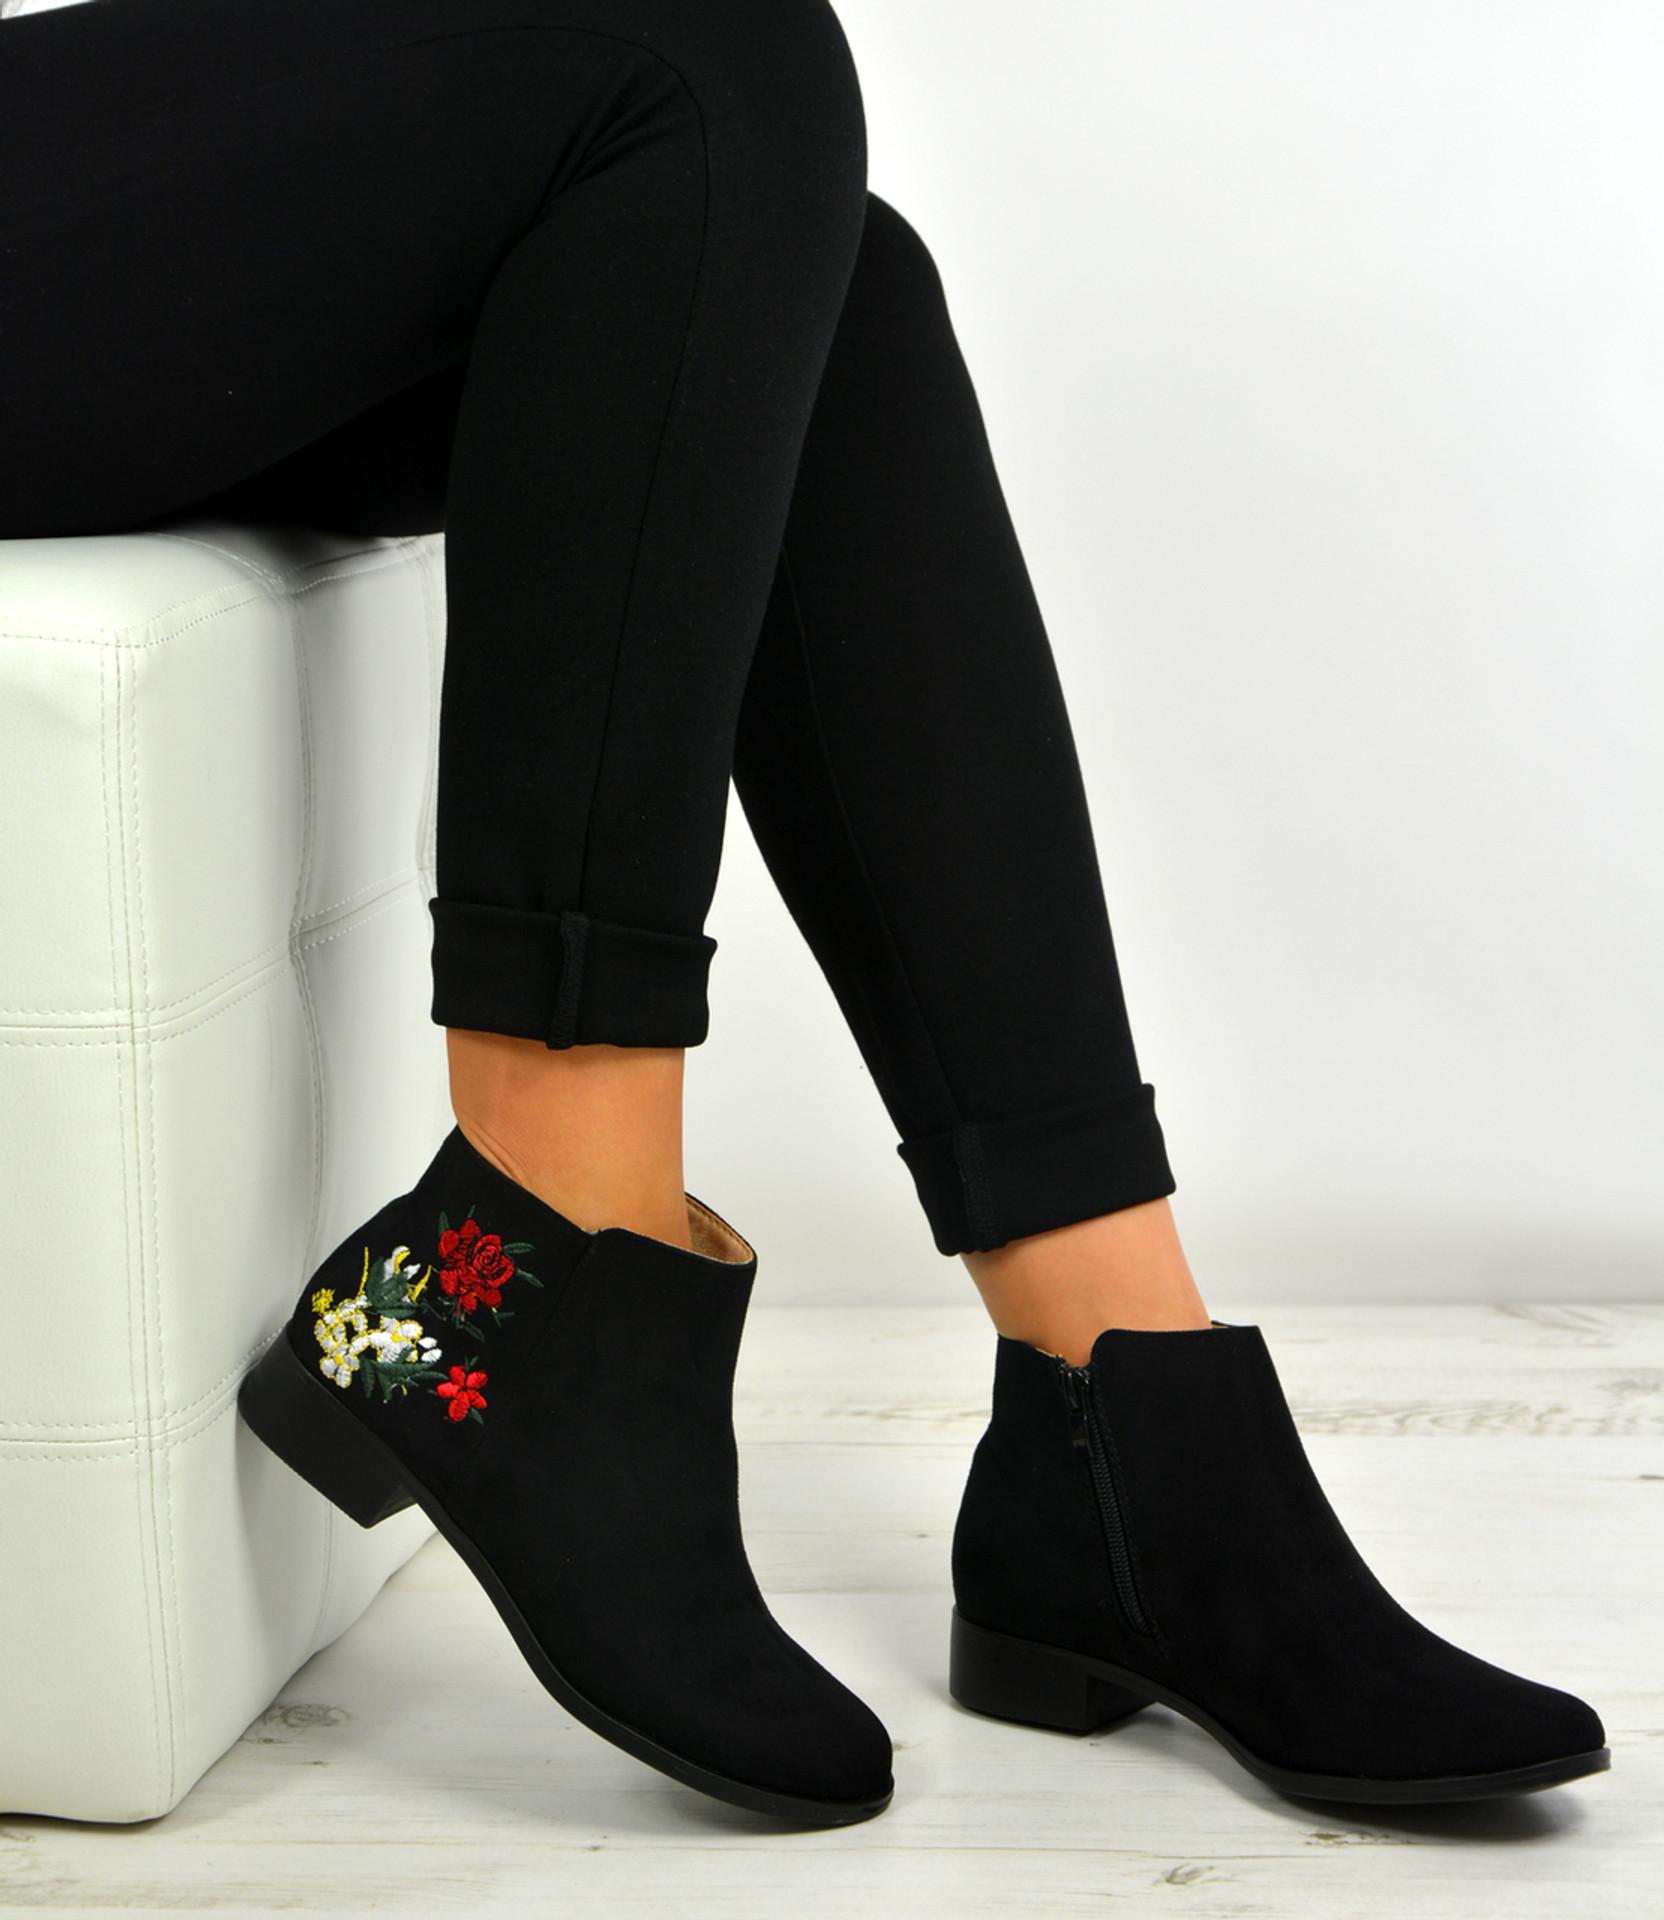 Lesly Black Side Flower Ankle Boots